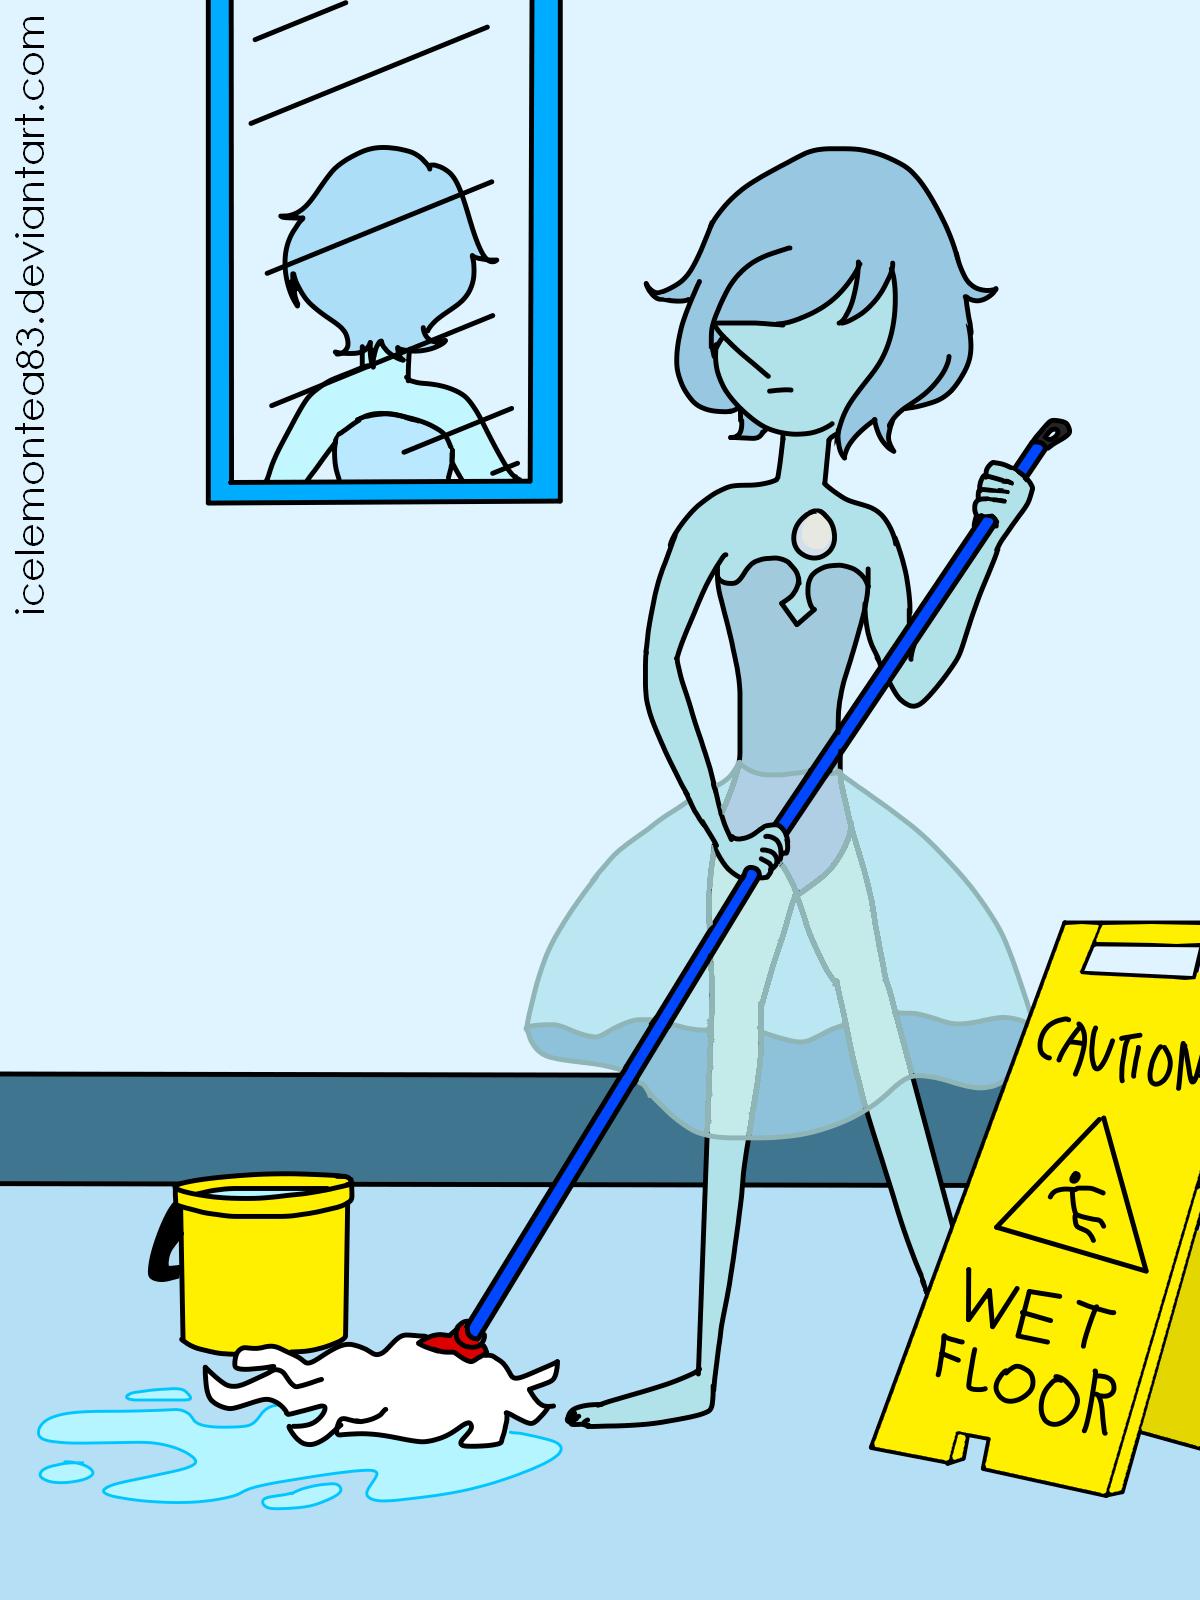 Toilet Blue Water